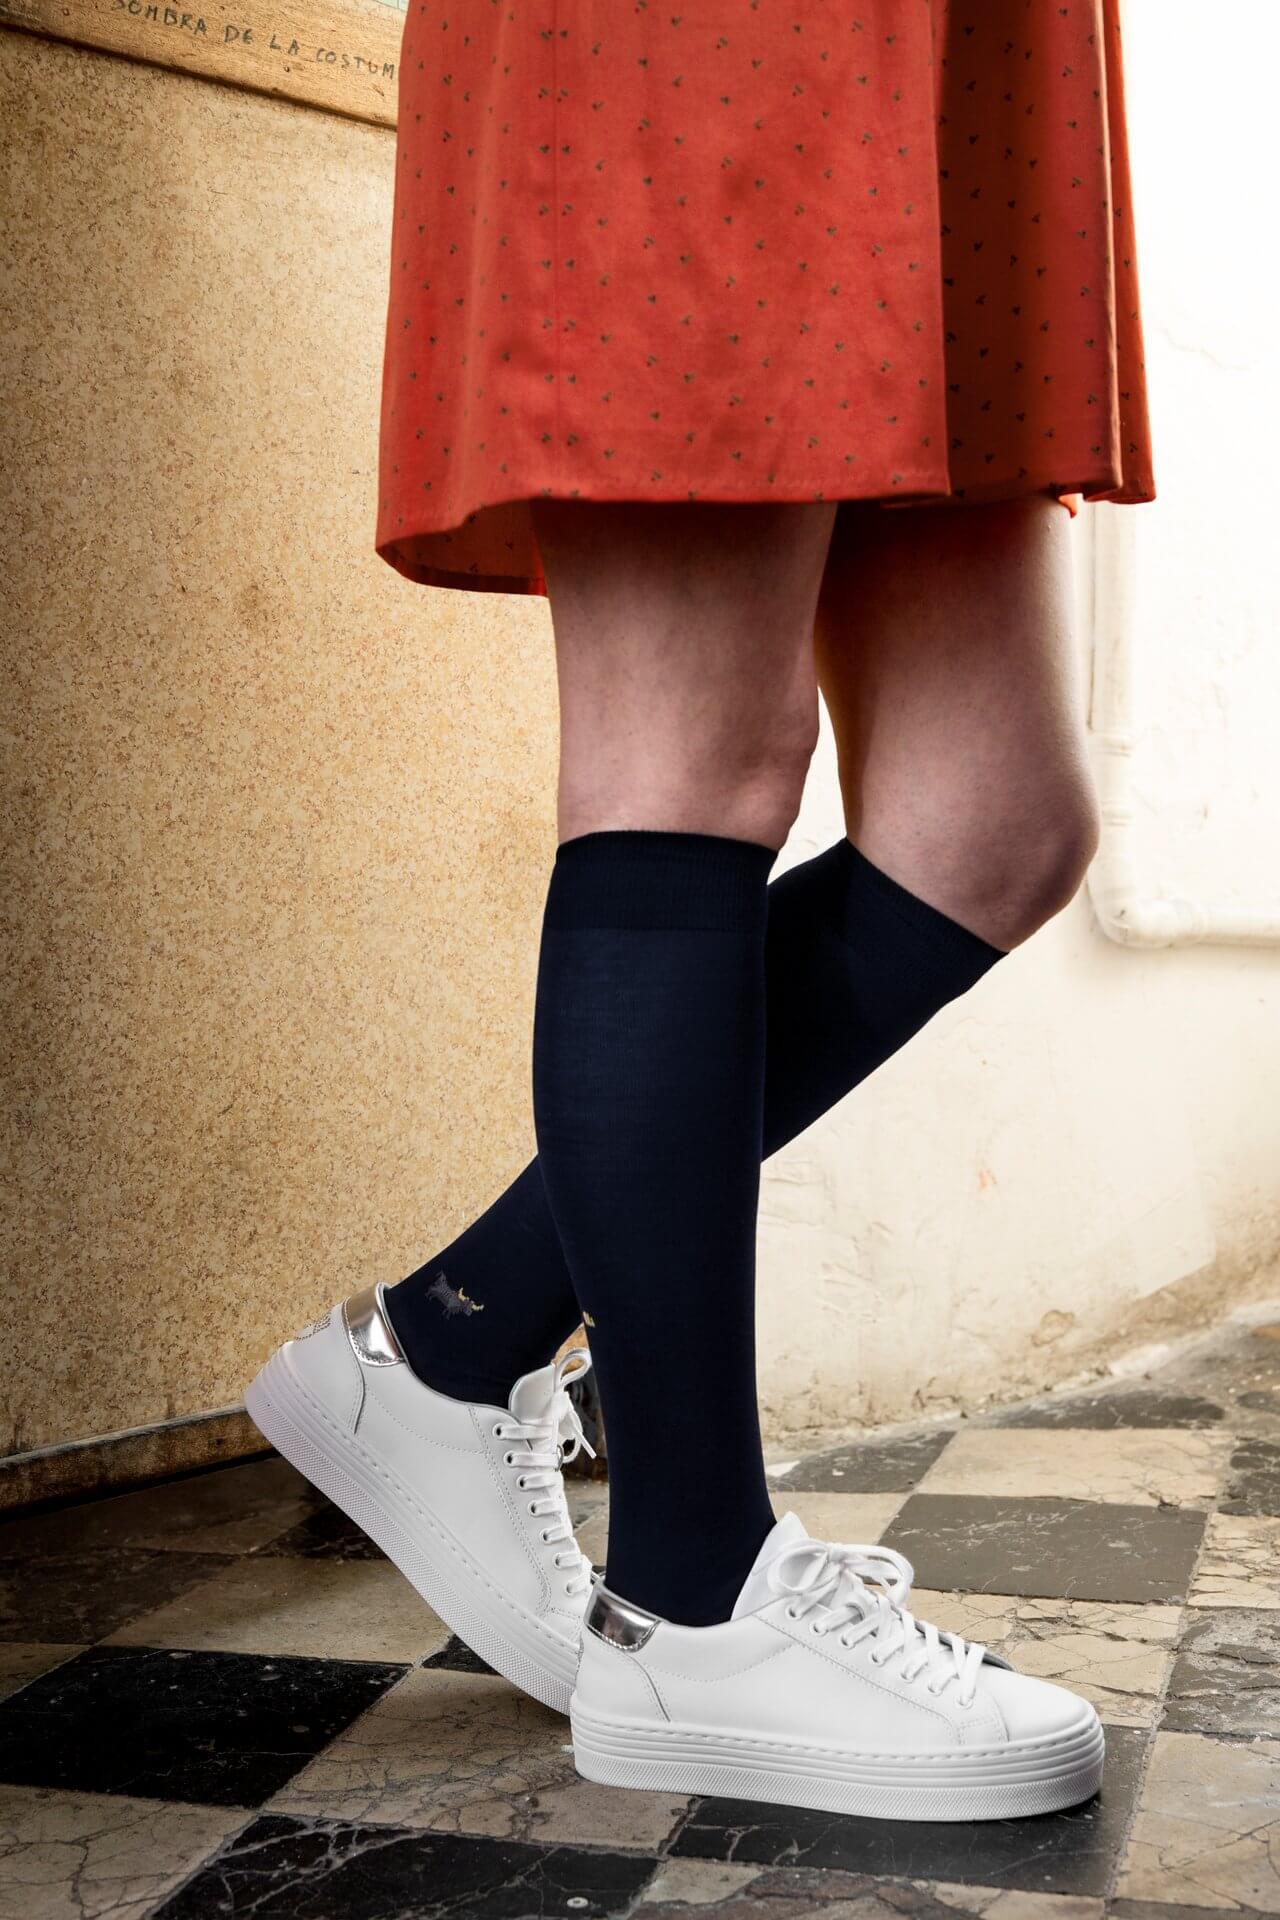 bufala socks 100% cotton